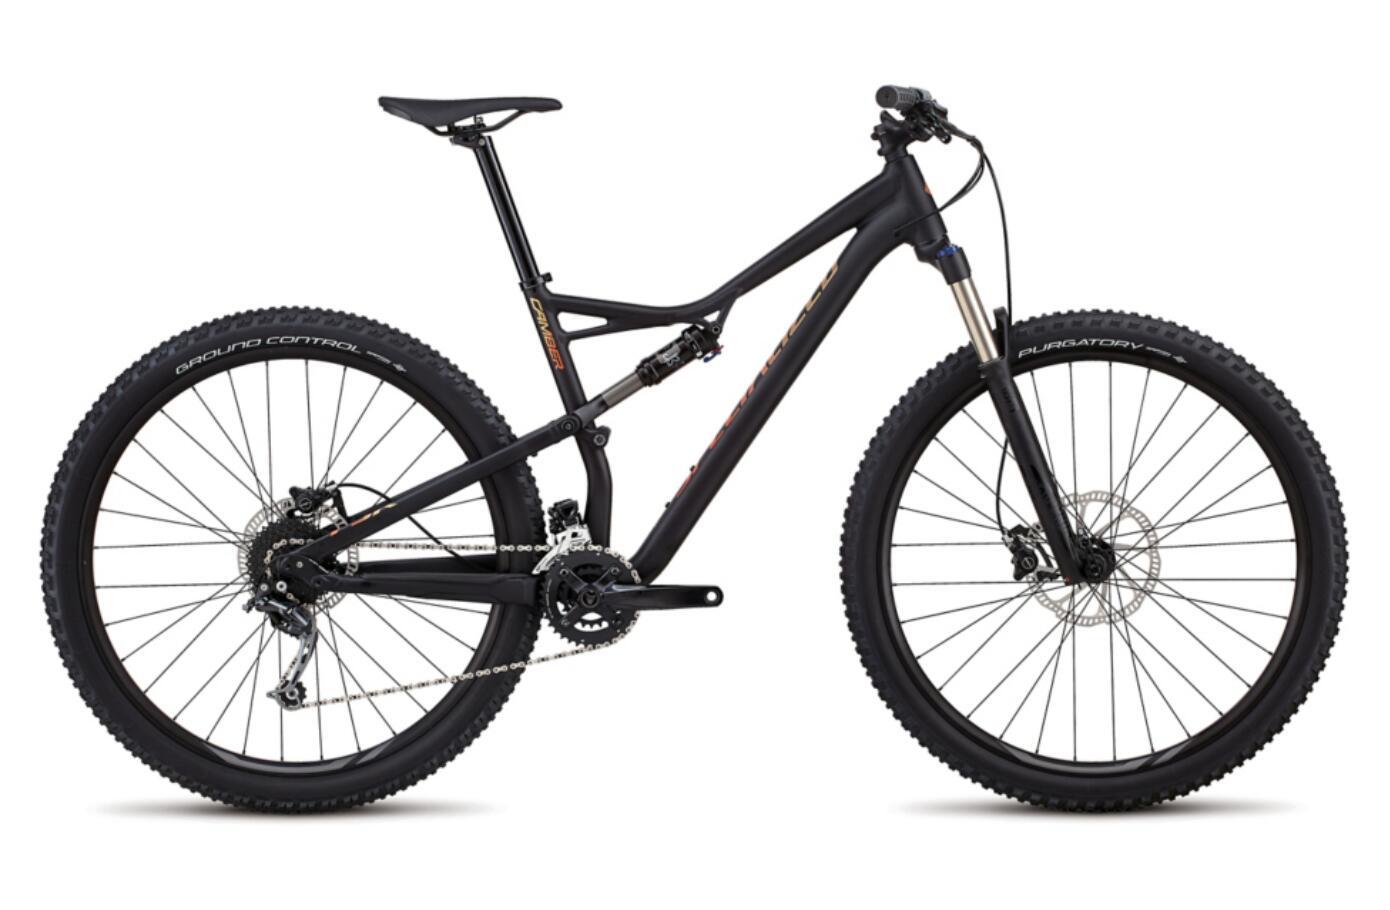 2018 Camber 29 Alloy Mountain Bike